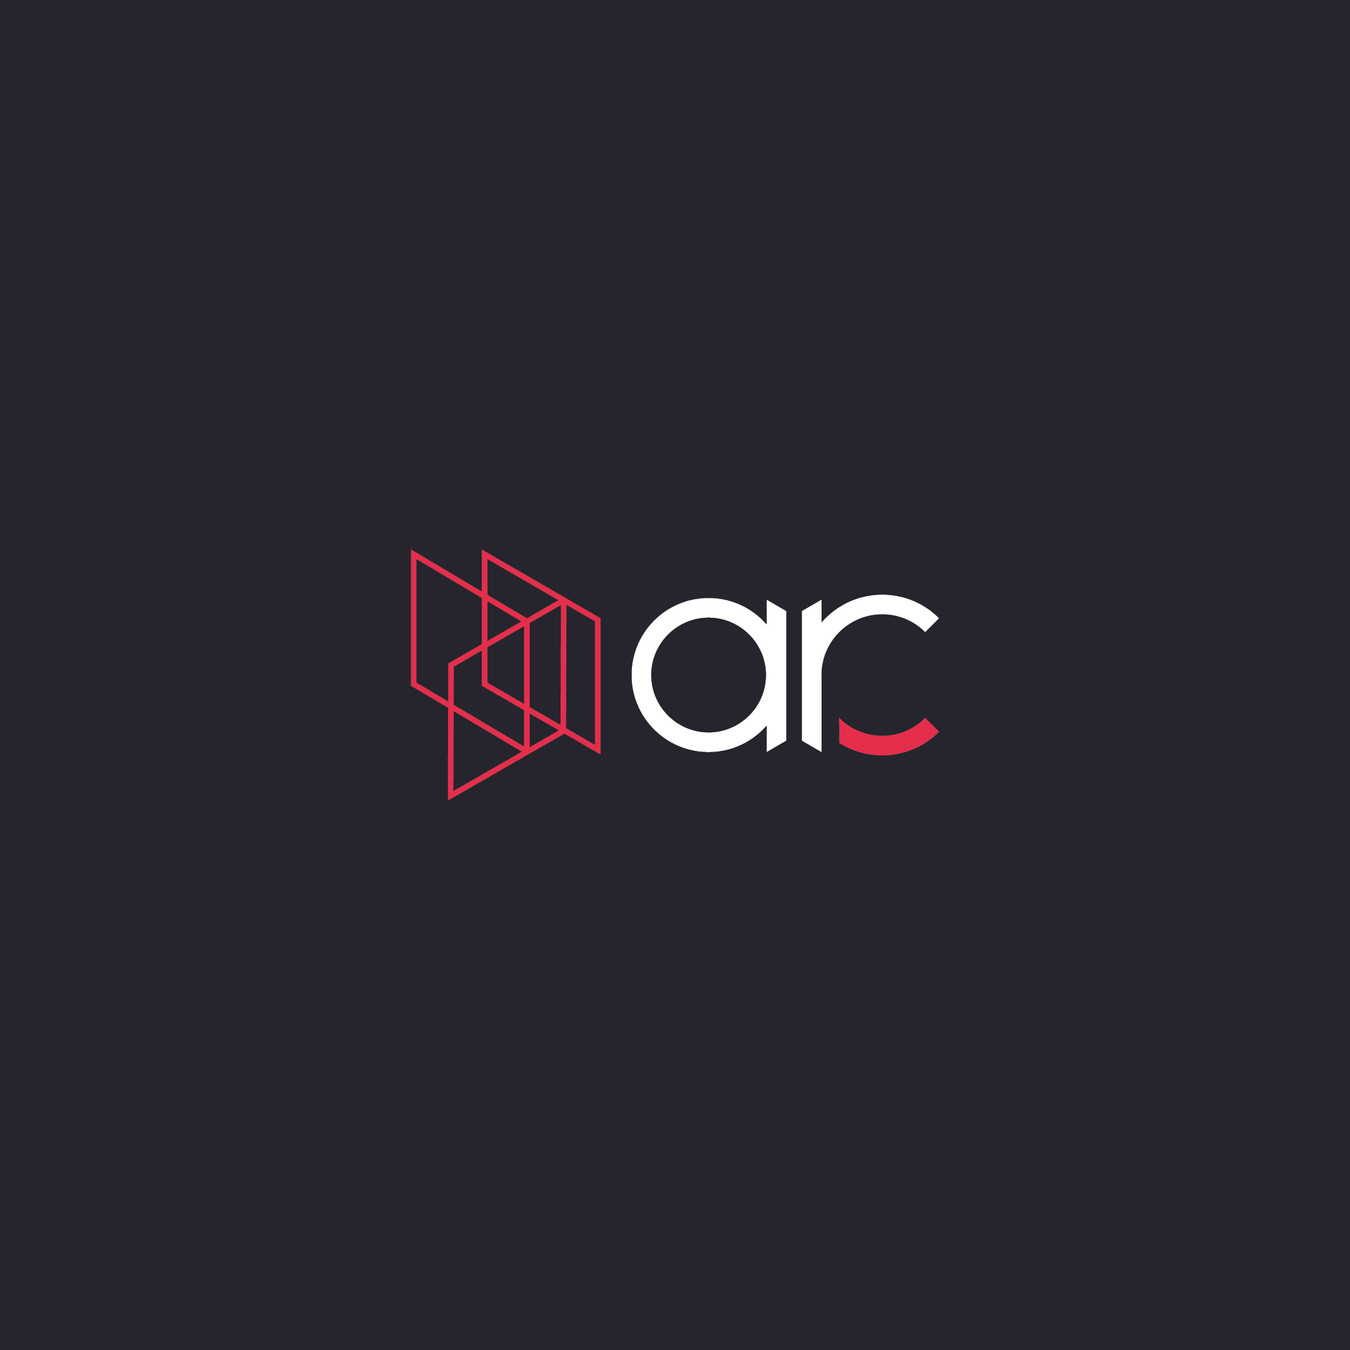 arc_logo_pinkonblack.jpg